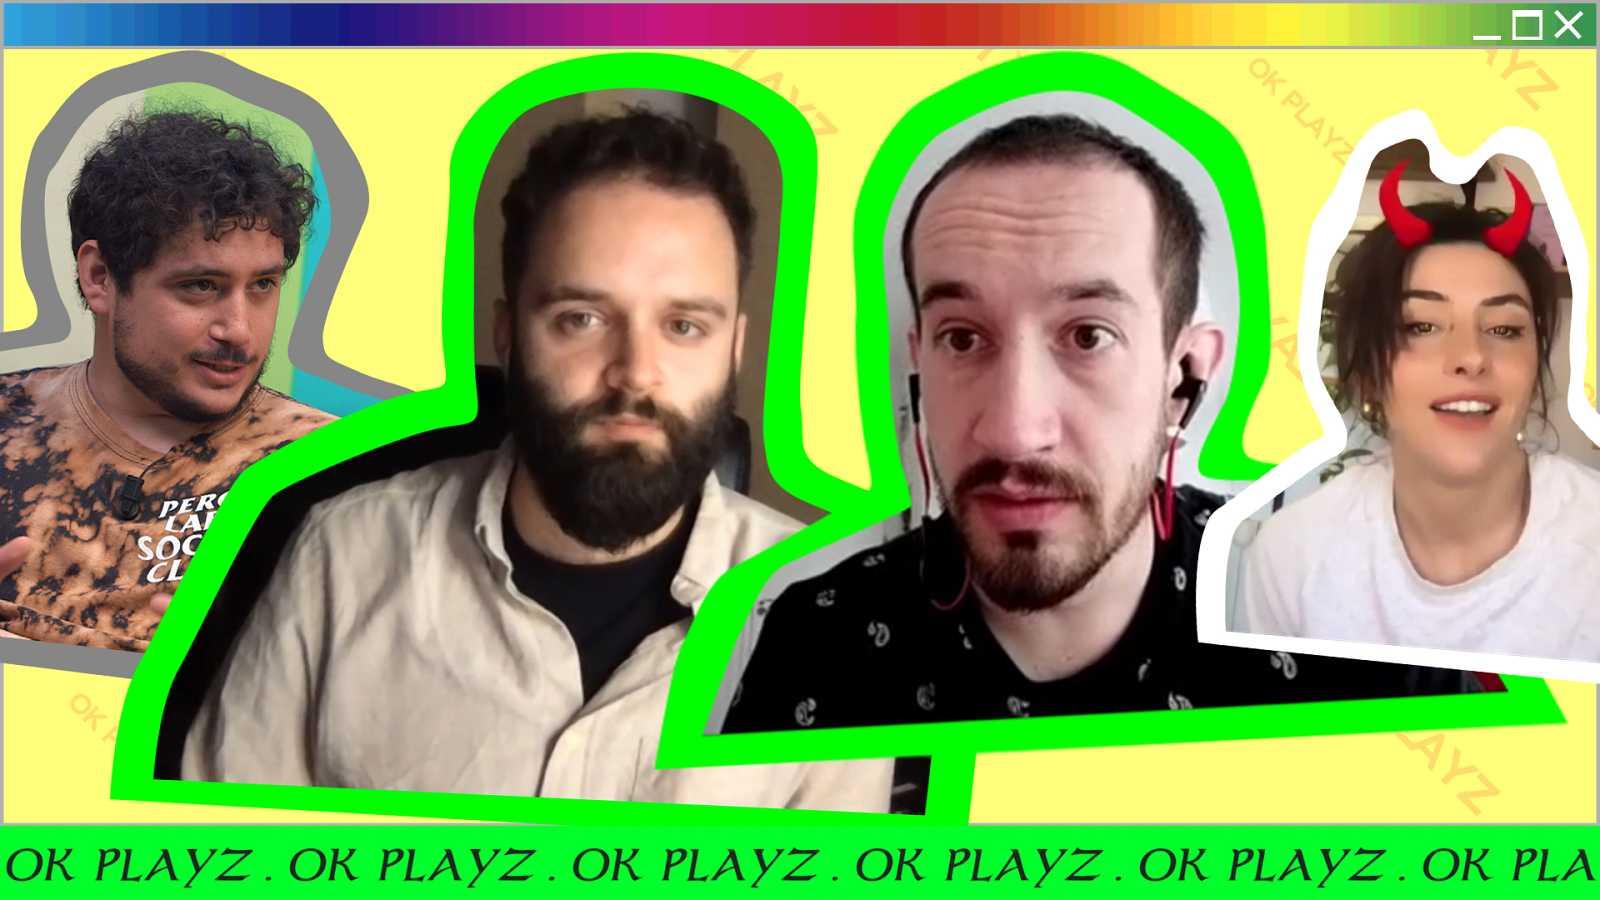 OK Playz - OK Playz con Pascu y Rodri, HJ Darger y Darío Eme Hache